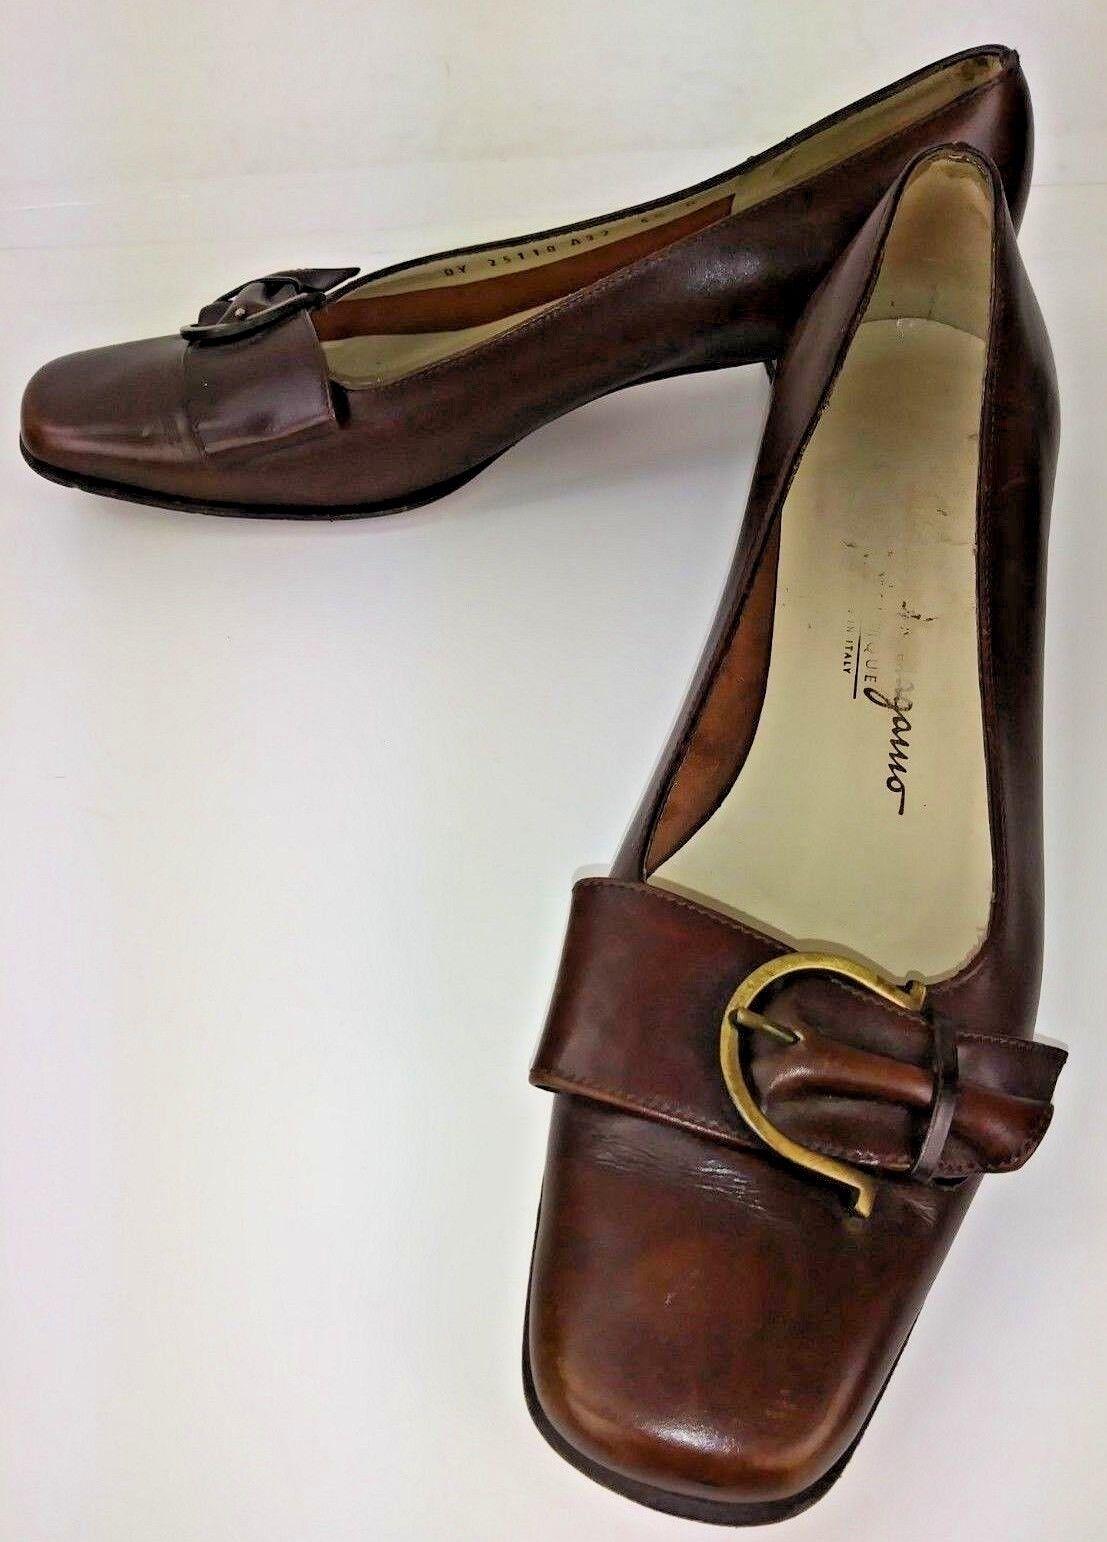 Salvatore Ferragamo 25118 Womens shoes Heels Pumps US 5.5 B Brown Leather 492